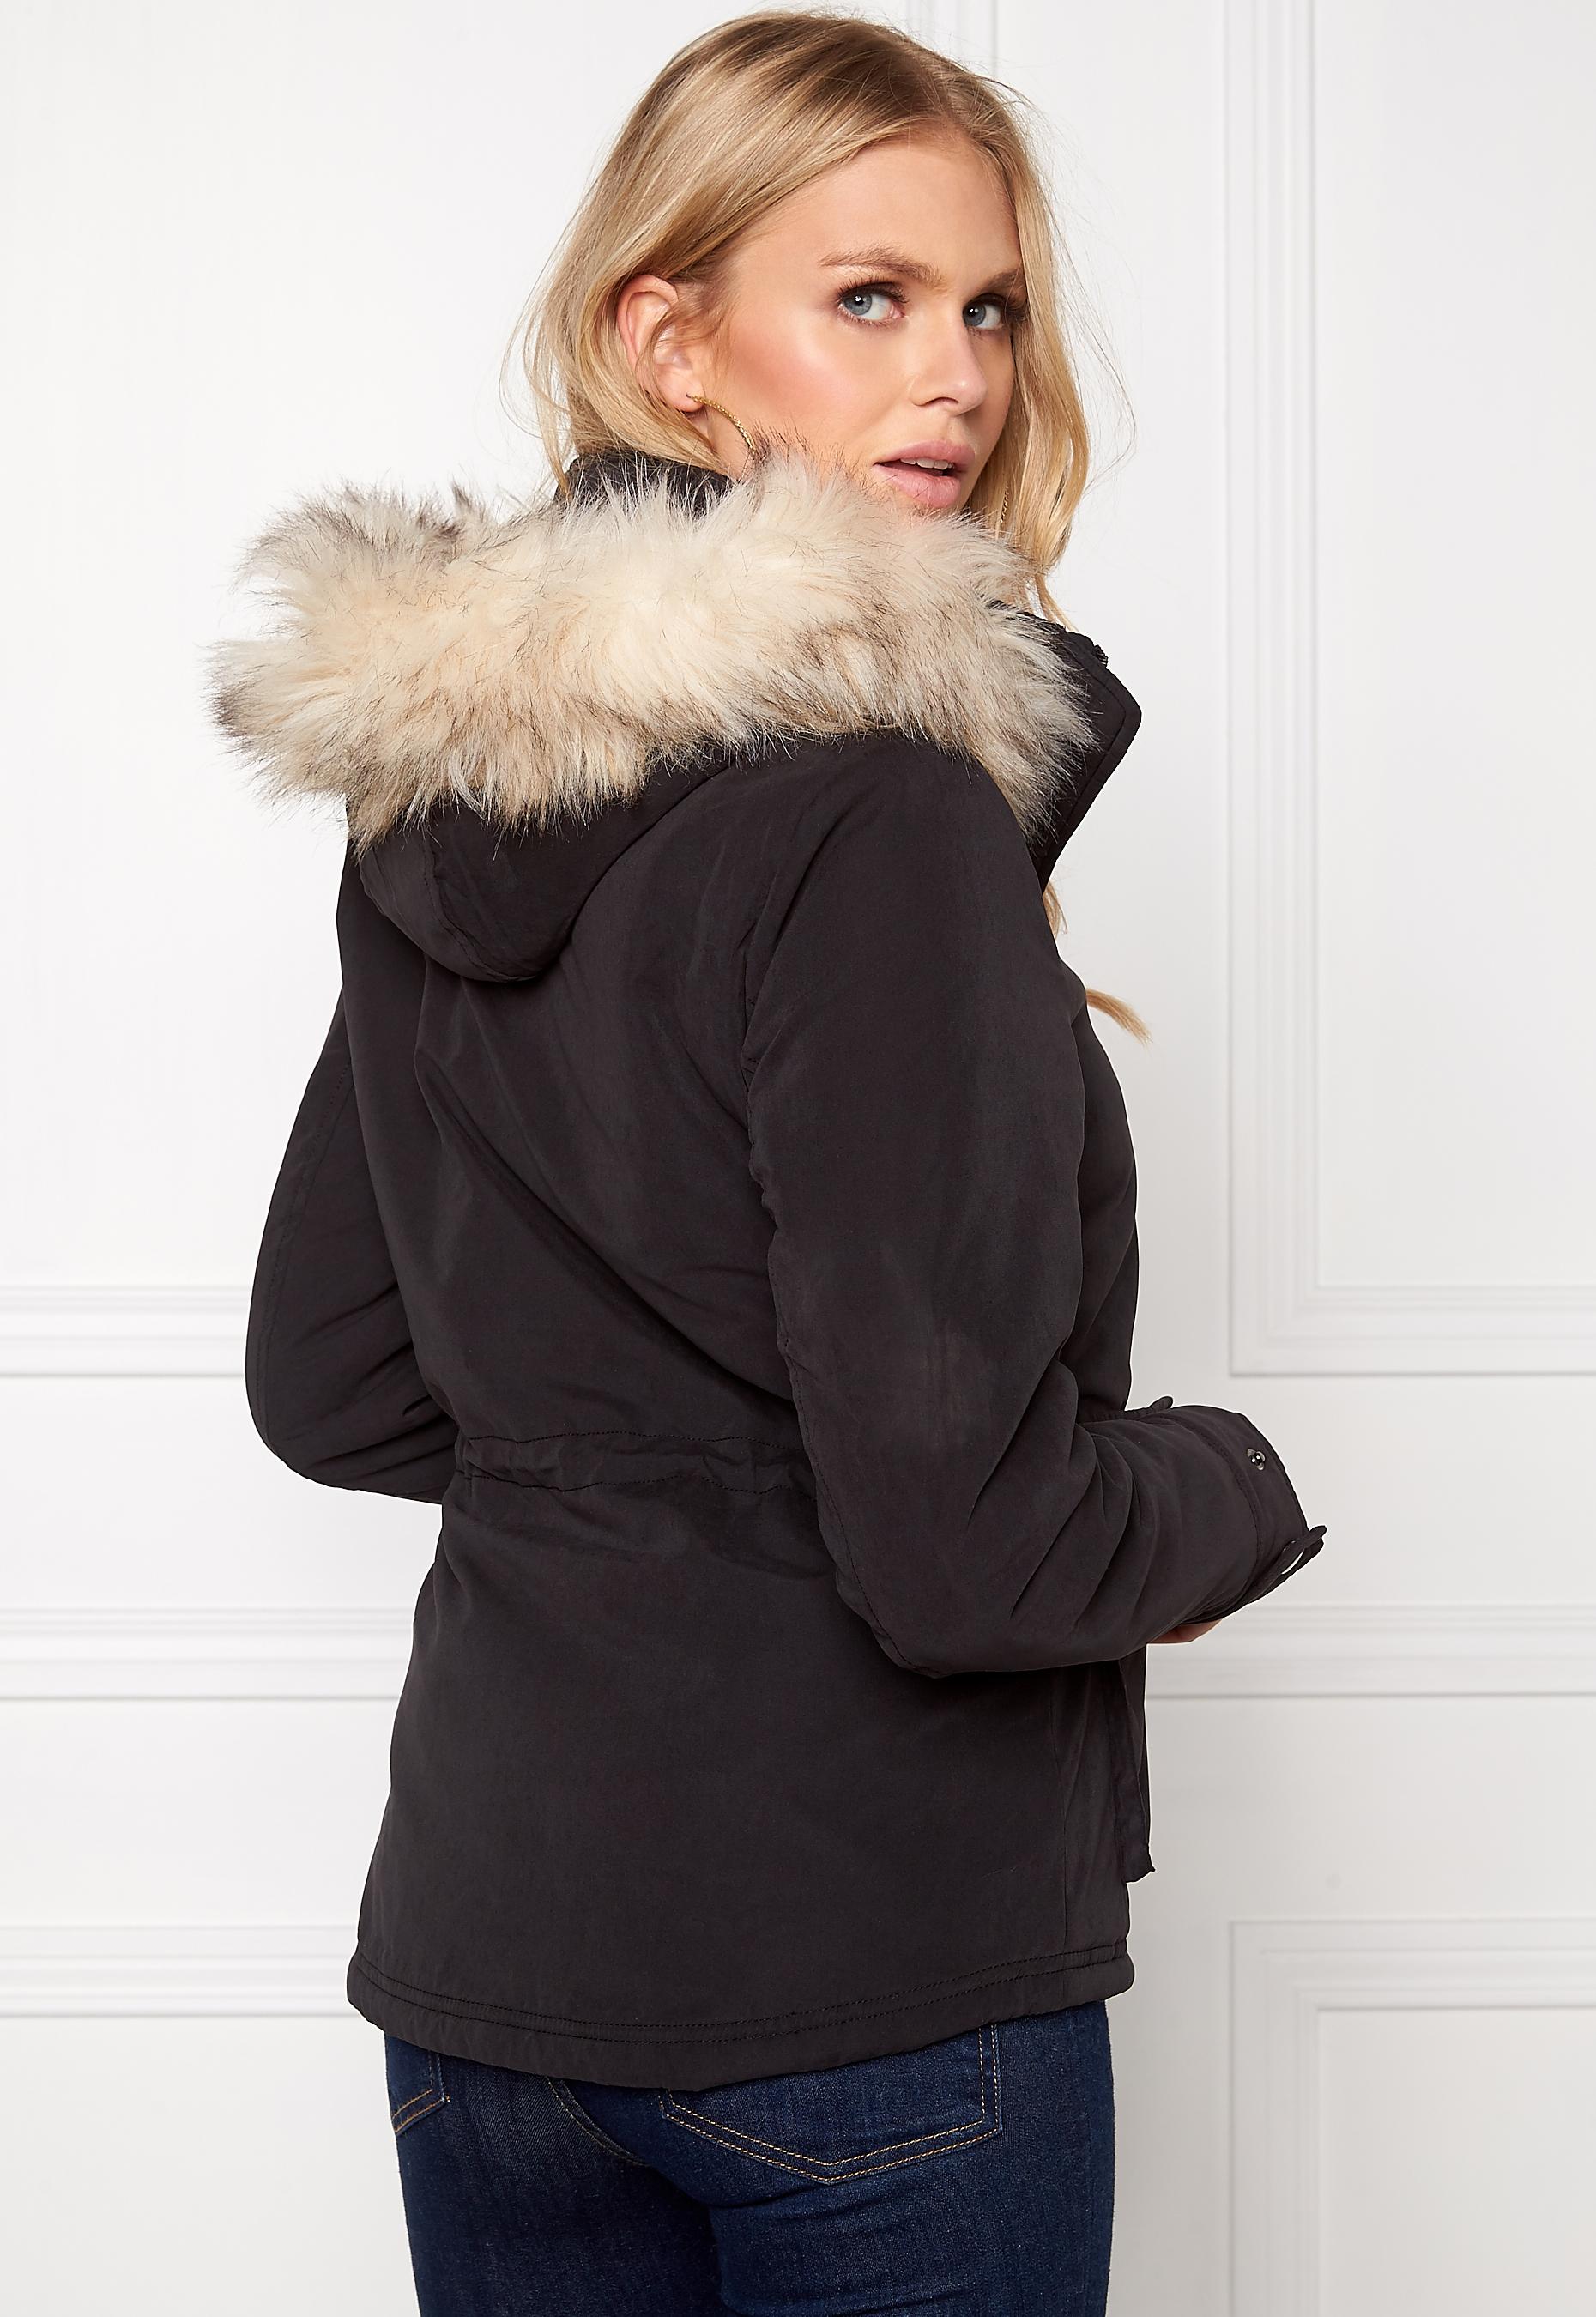 ONLY Starlight Fur Parka Black - Bubbleroom 9911fa6863